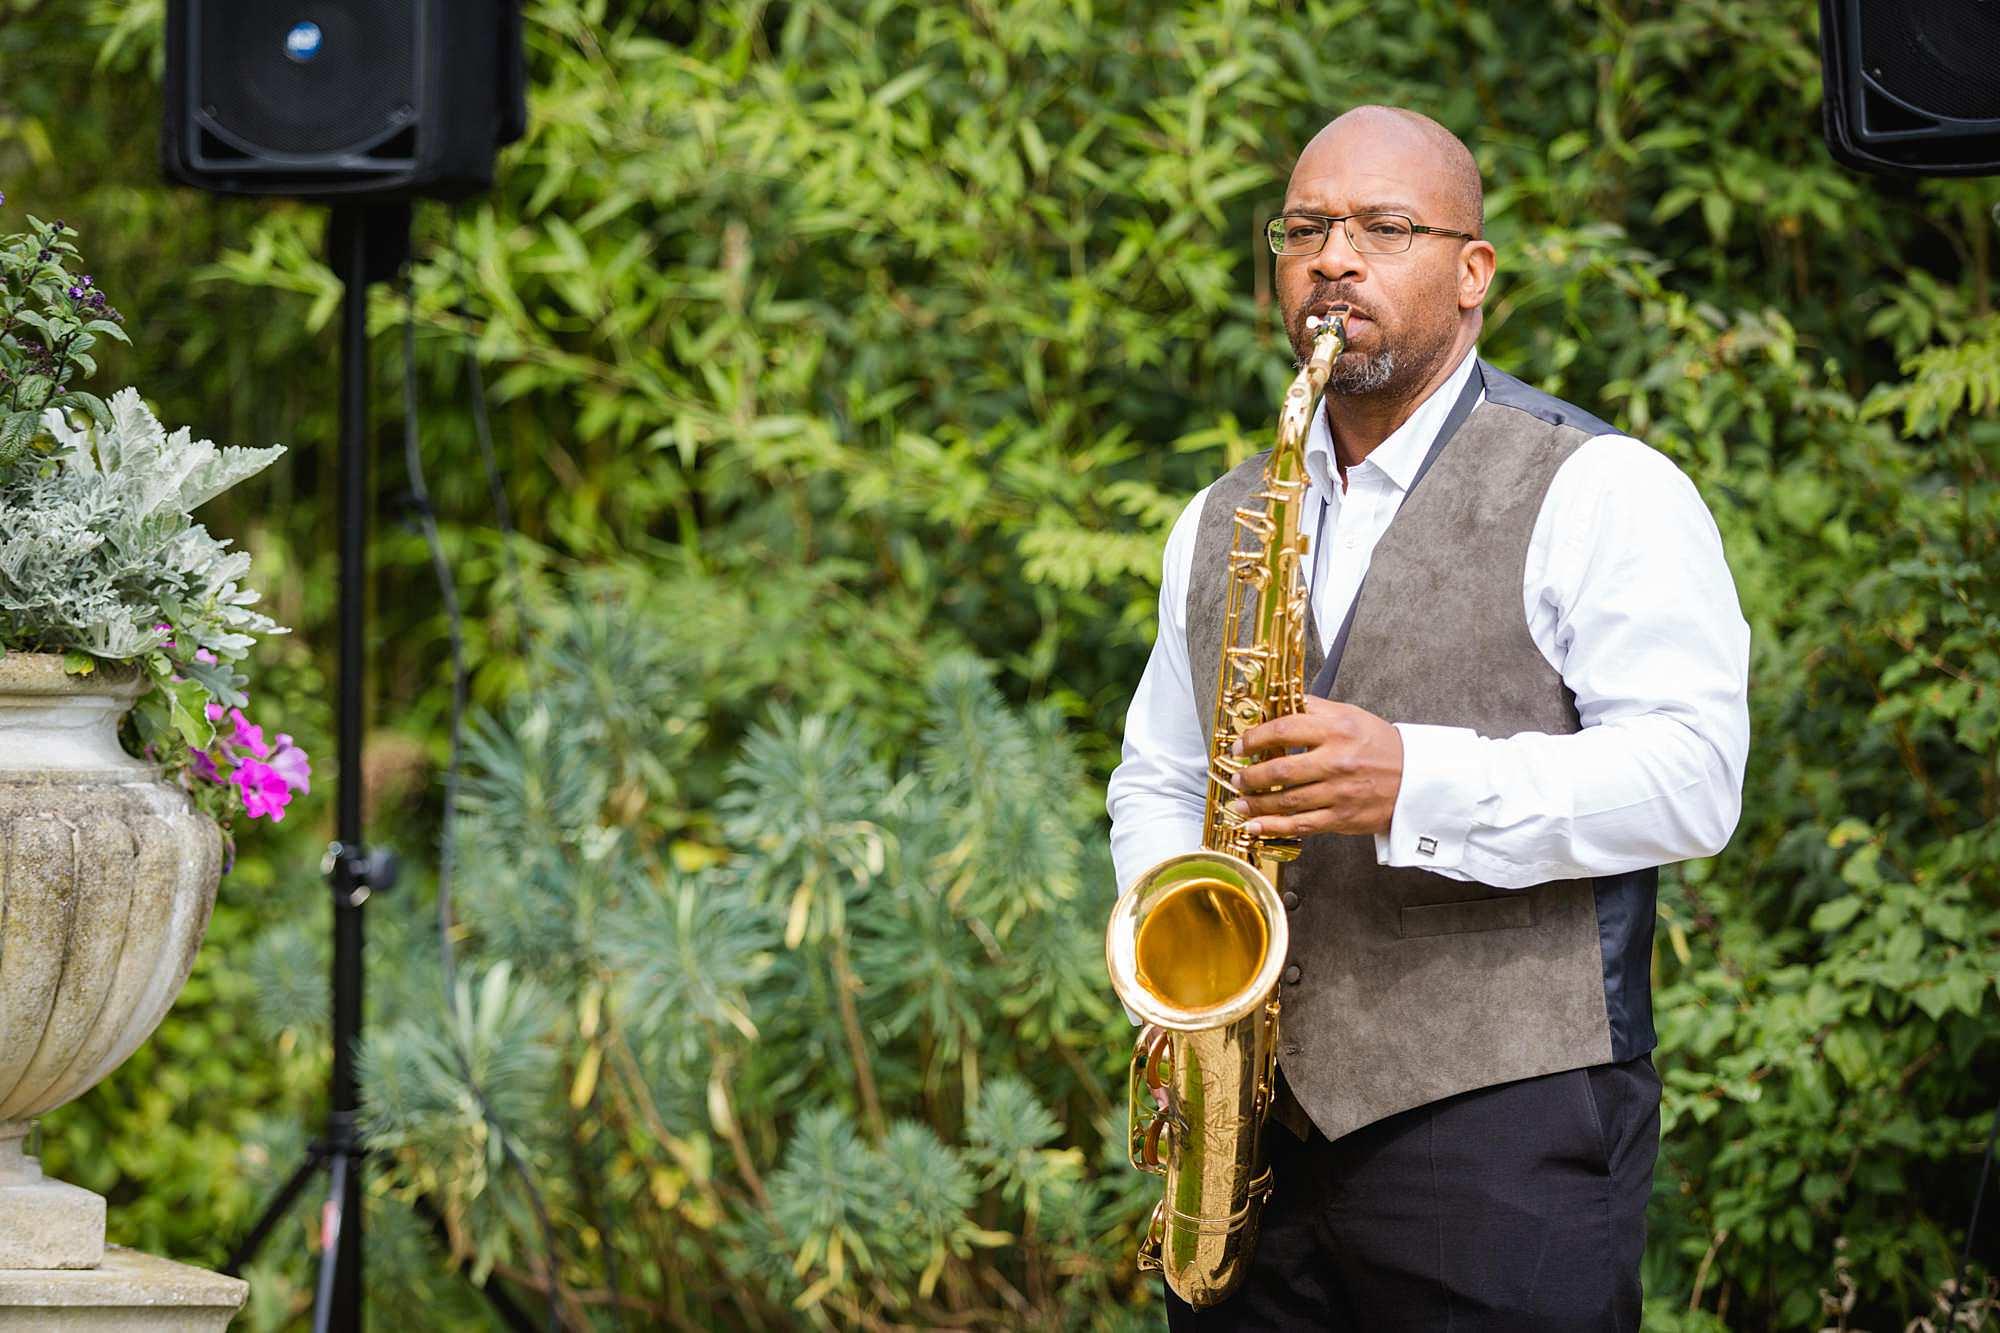 Writtle university college wedding saxophone player